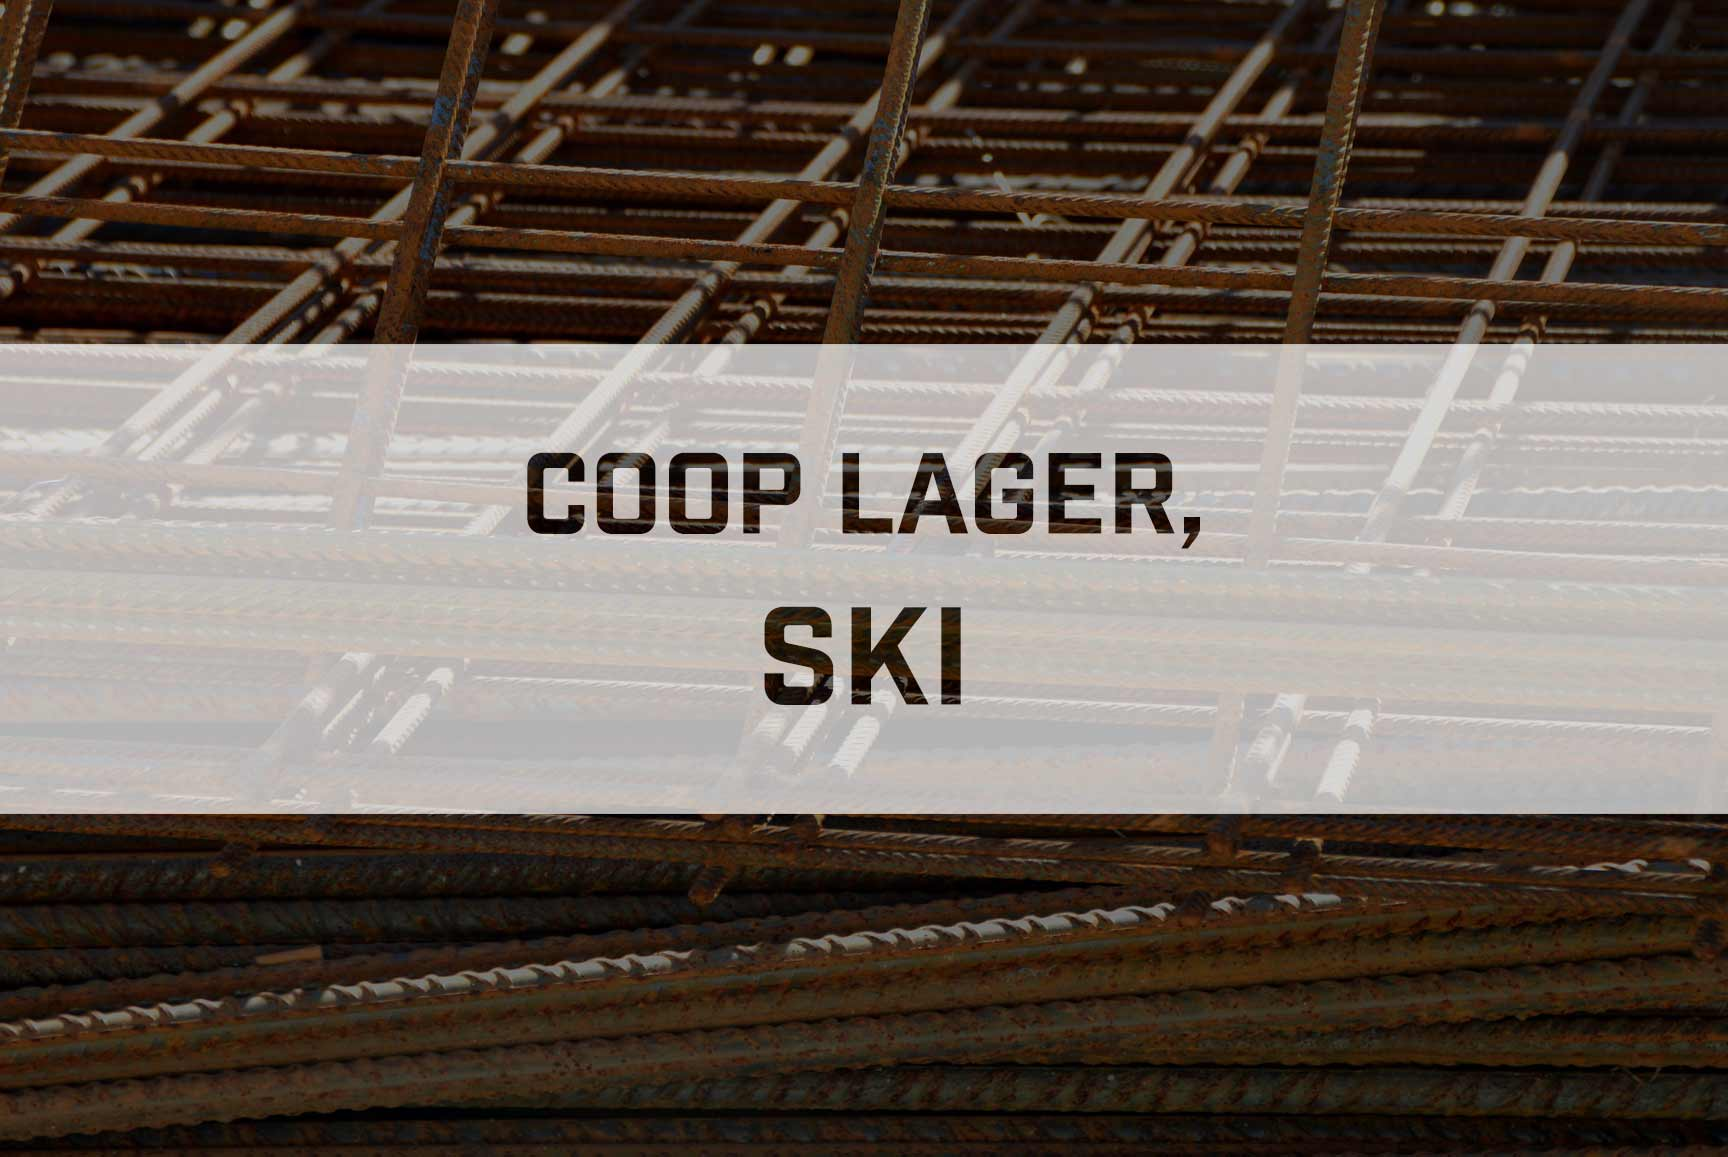 Prosjekt Coop Lager, Ski